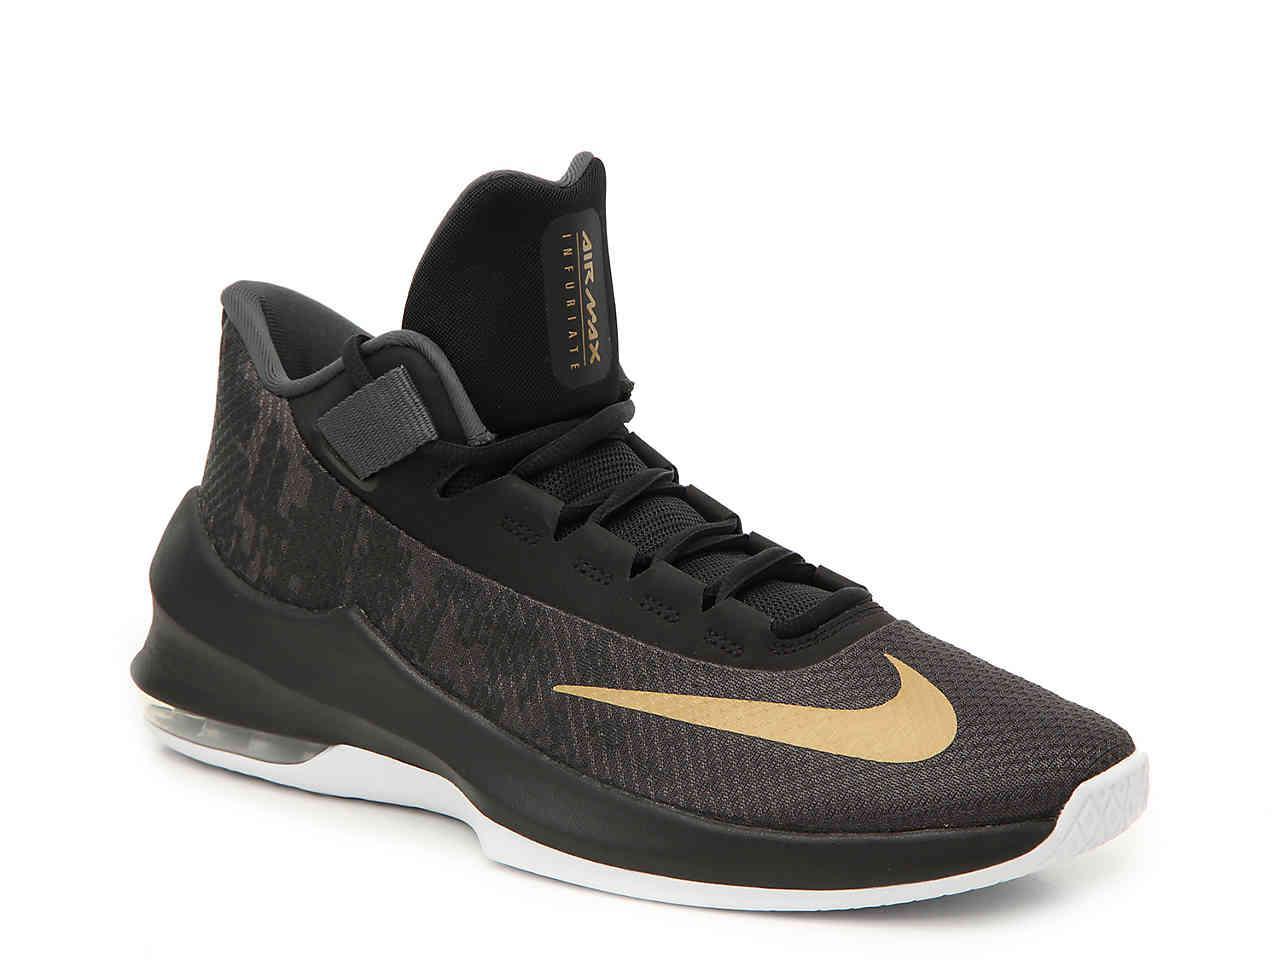 Lyst - Nike Air Max Infuriate 2 Basketball Sneaker in Black for Men d1d08e9c9